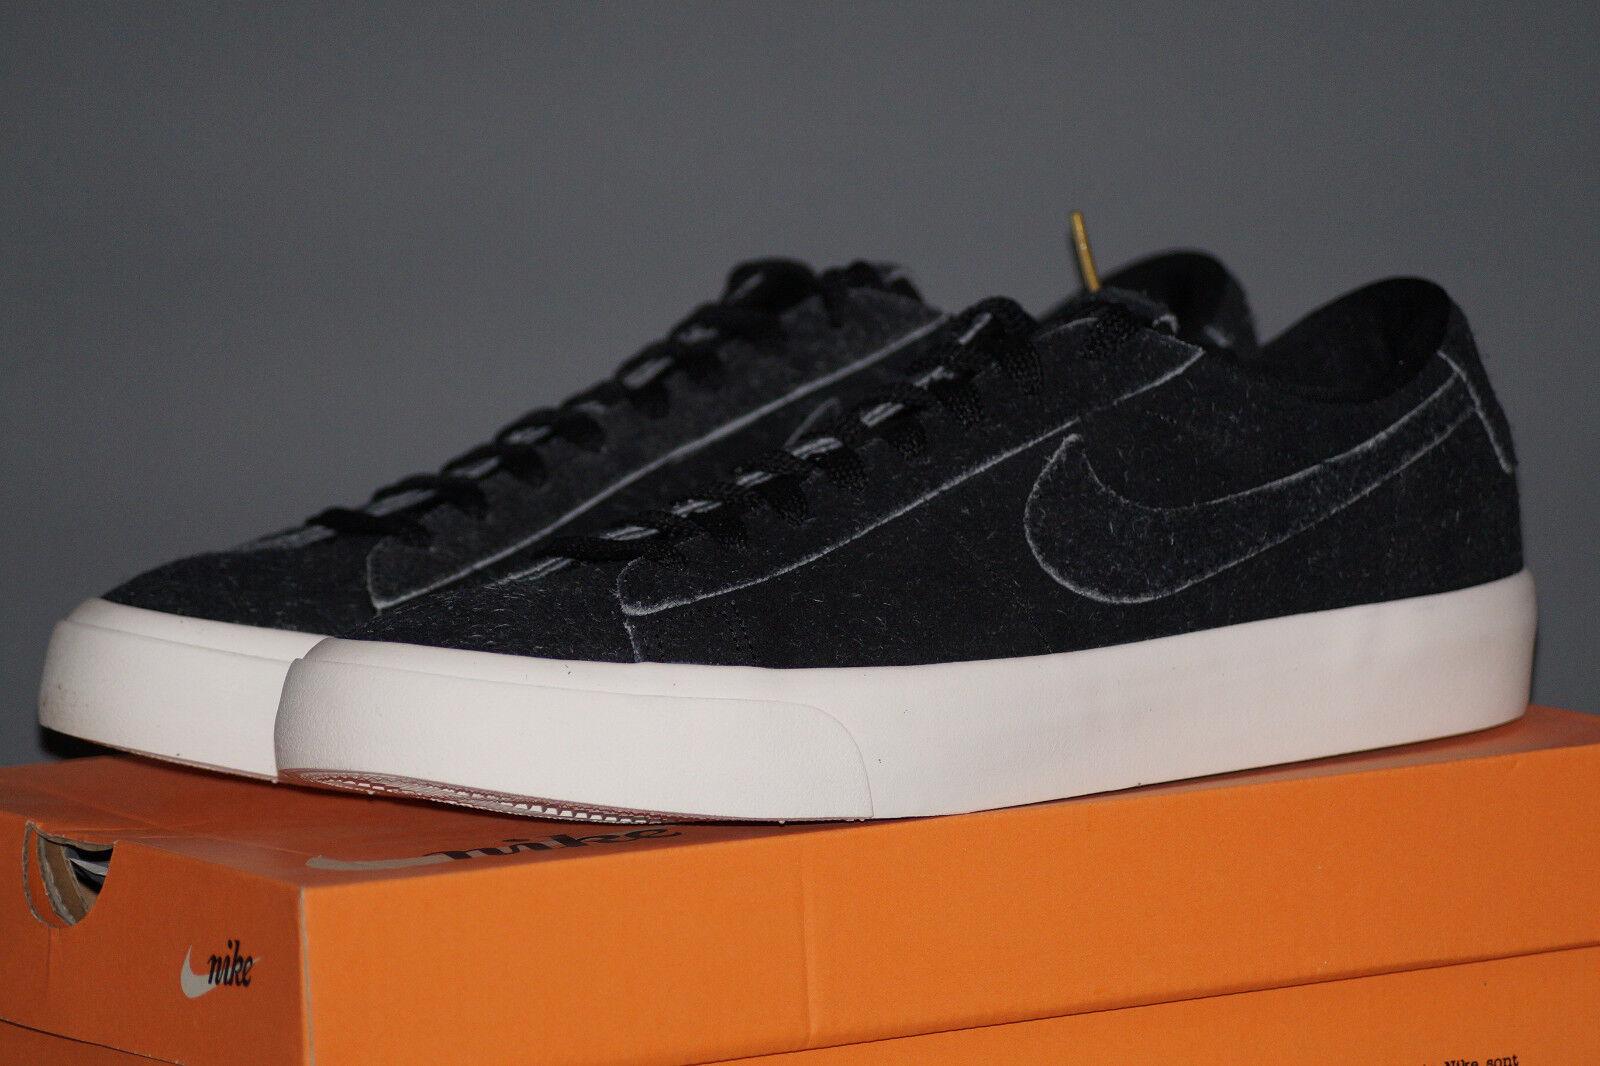 Nike Blazer Studio Low EU 45.5 UK 10.5 schwarz schwarz Leder 880872-002 Stilvoll und charmant